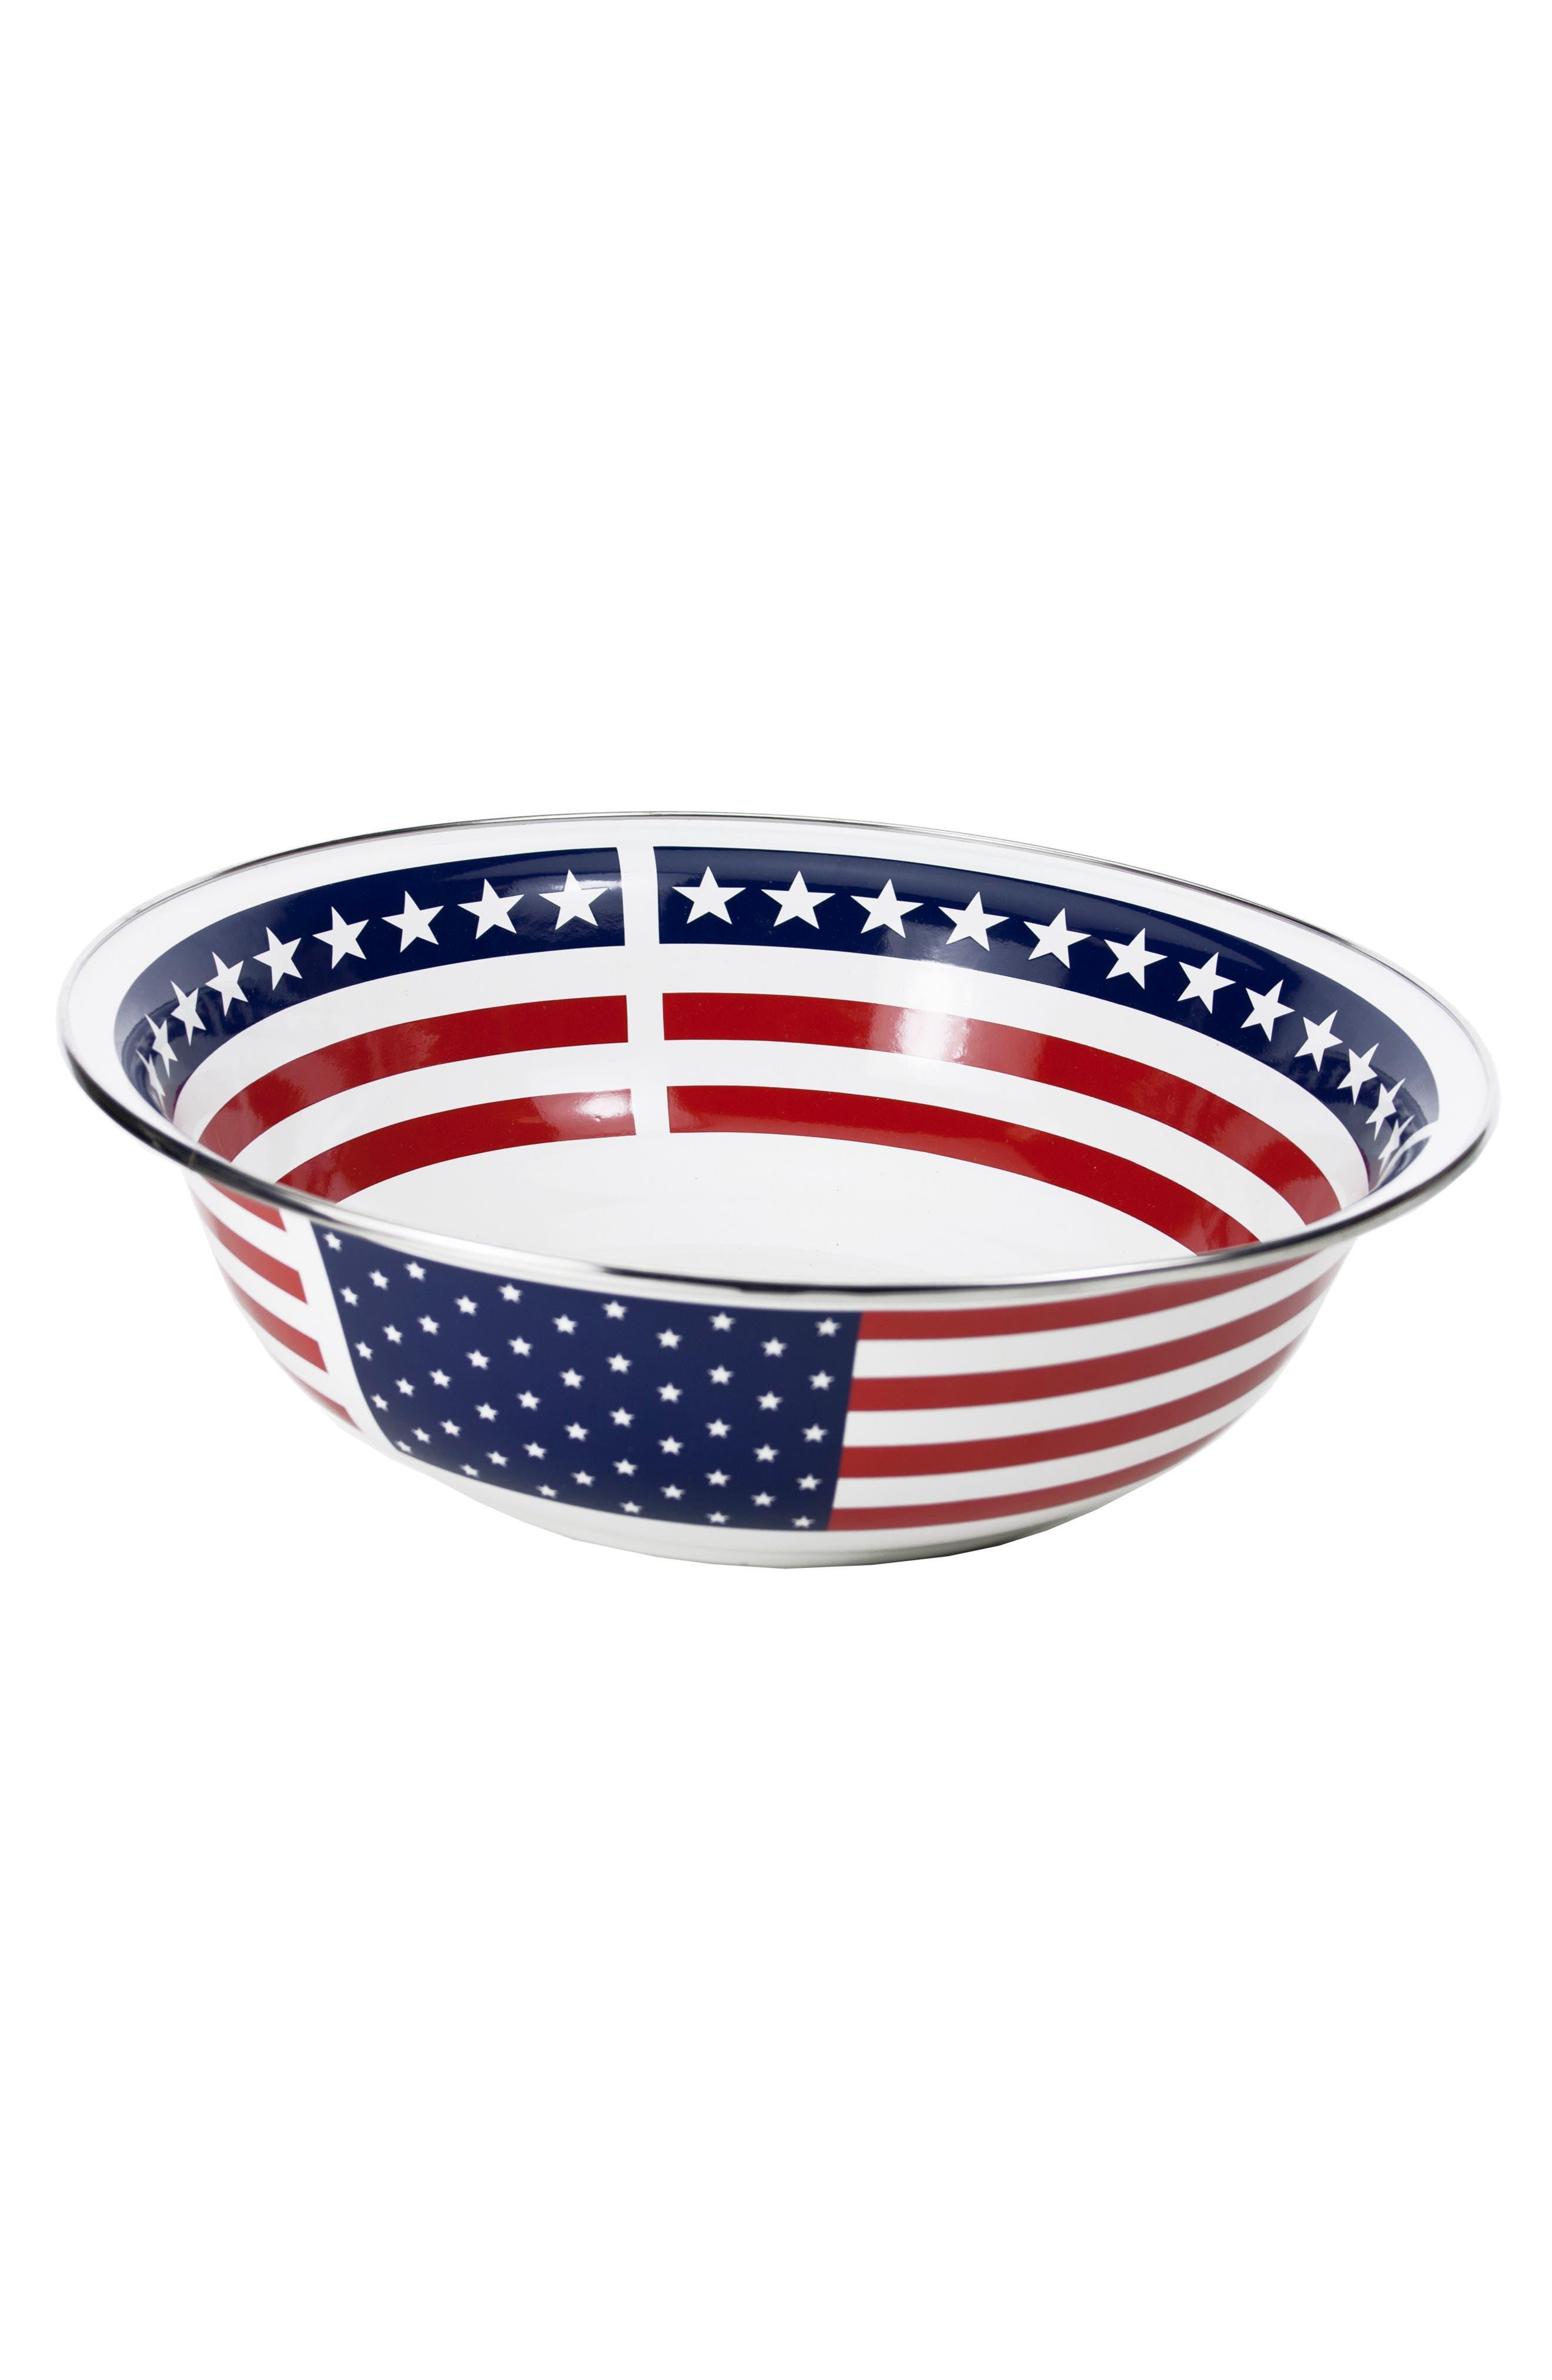 Stars & Stripes Serving Bowl,                             Main thumbnail 1, color,                             Stars And Stripes